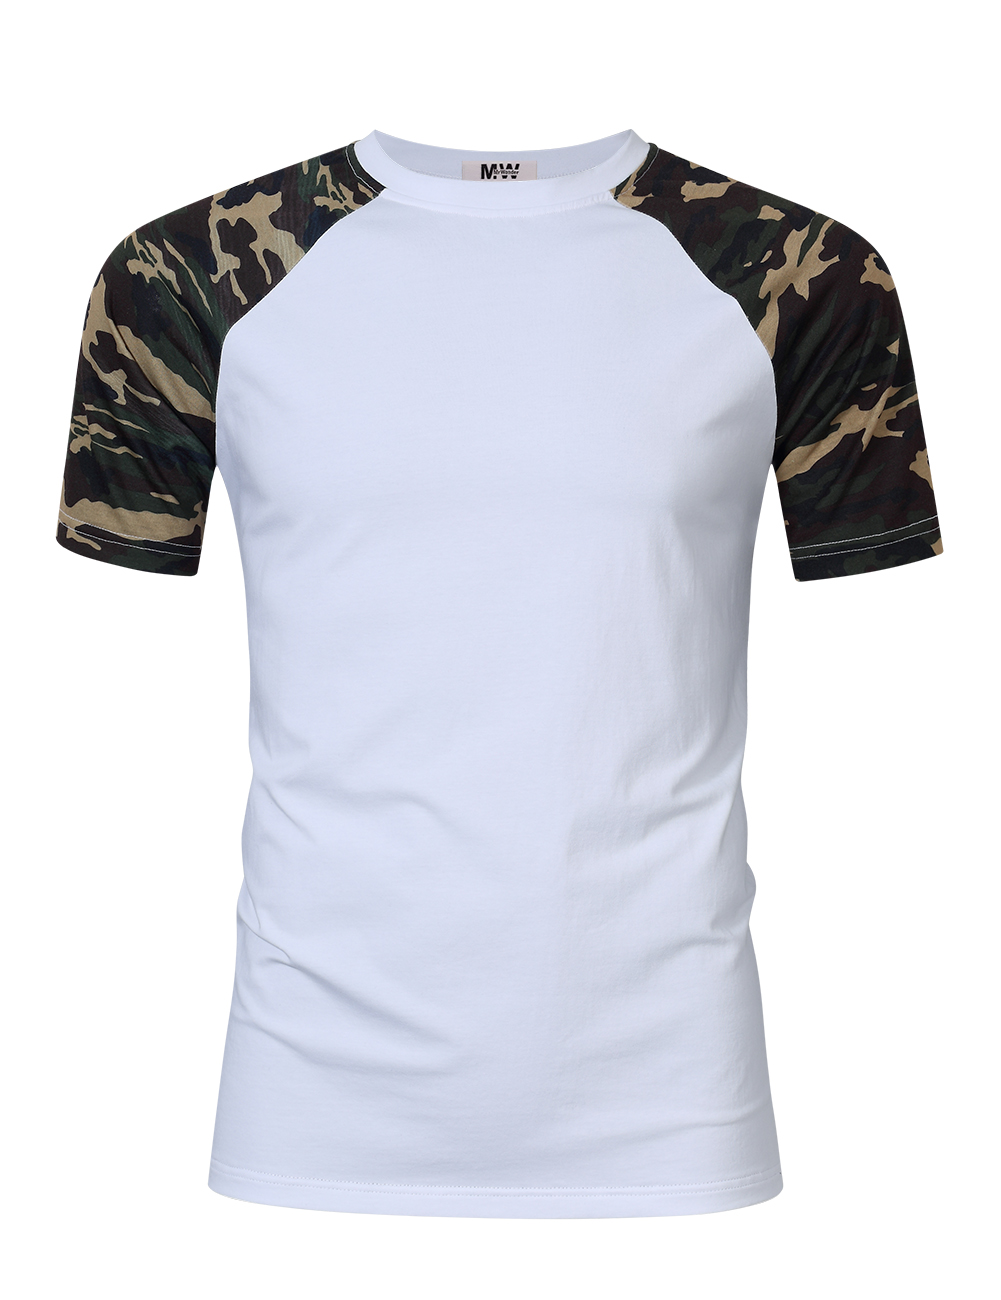 [US Direct] MrWonder Men Cotton Camouflage Short Sleeve Slim Fit Baseball T-Shirt